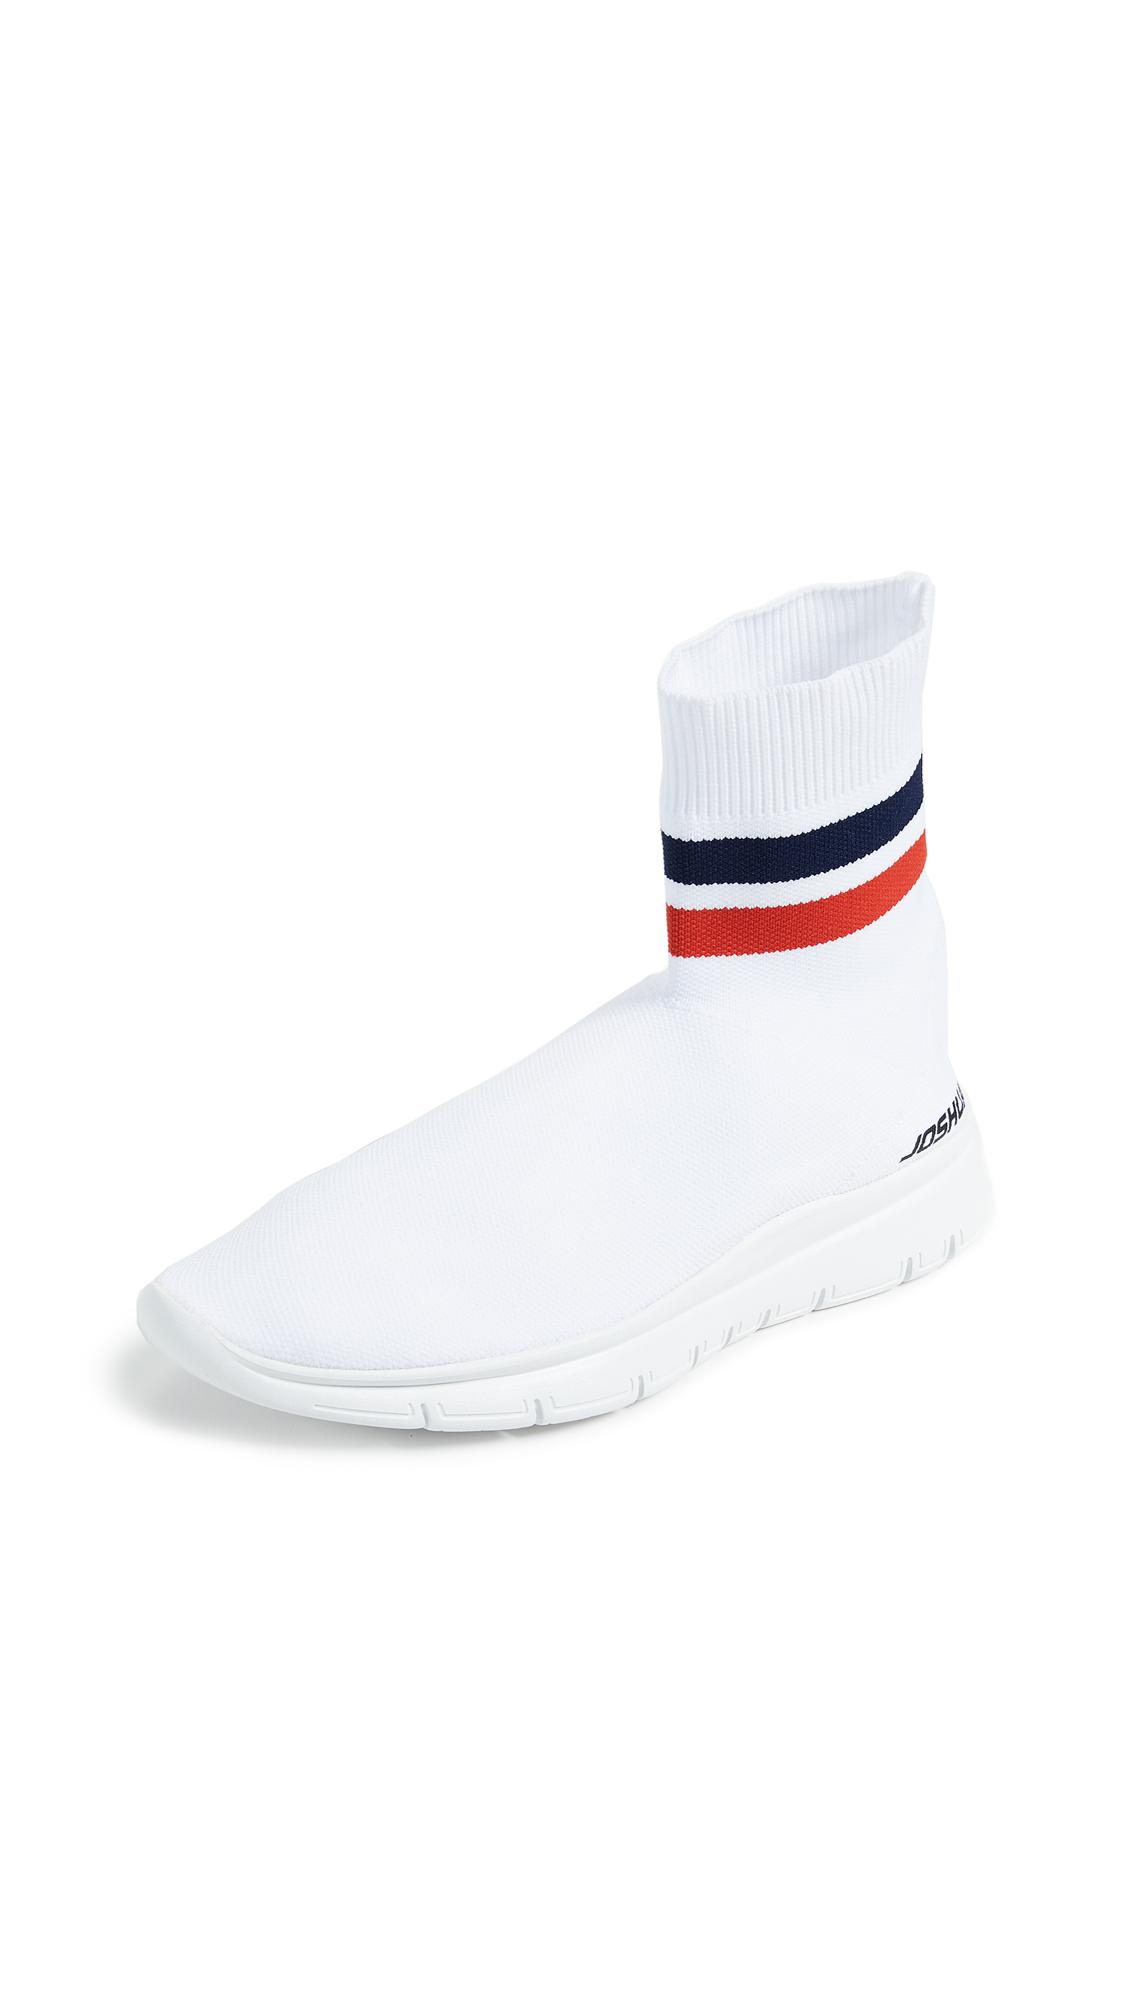 Joshua Sanders White Knit Logo Scallop Sneakers 3IAuji